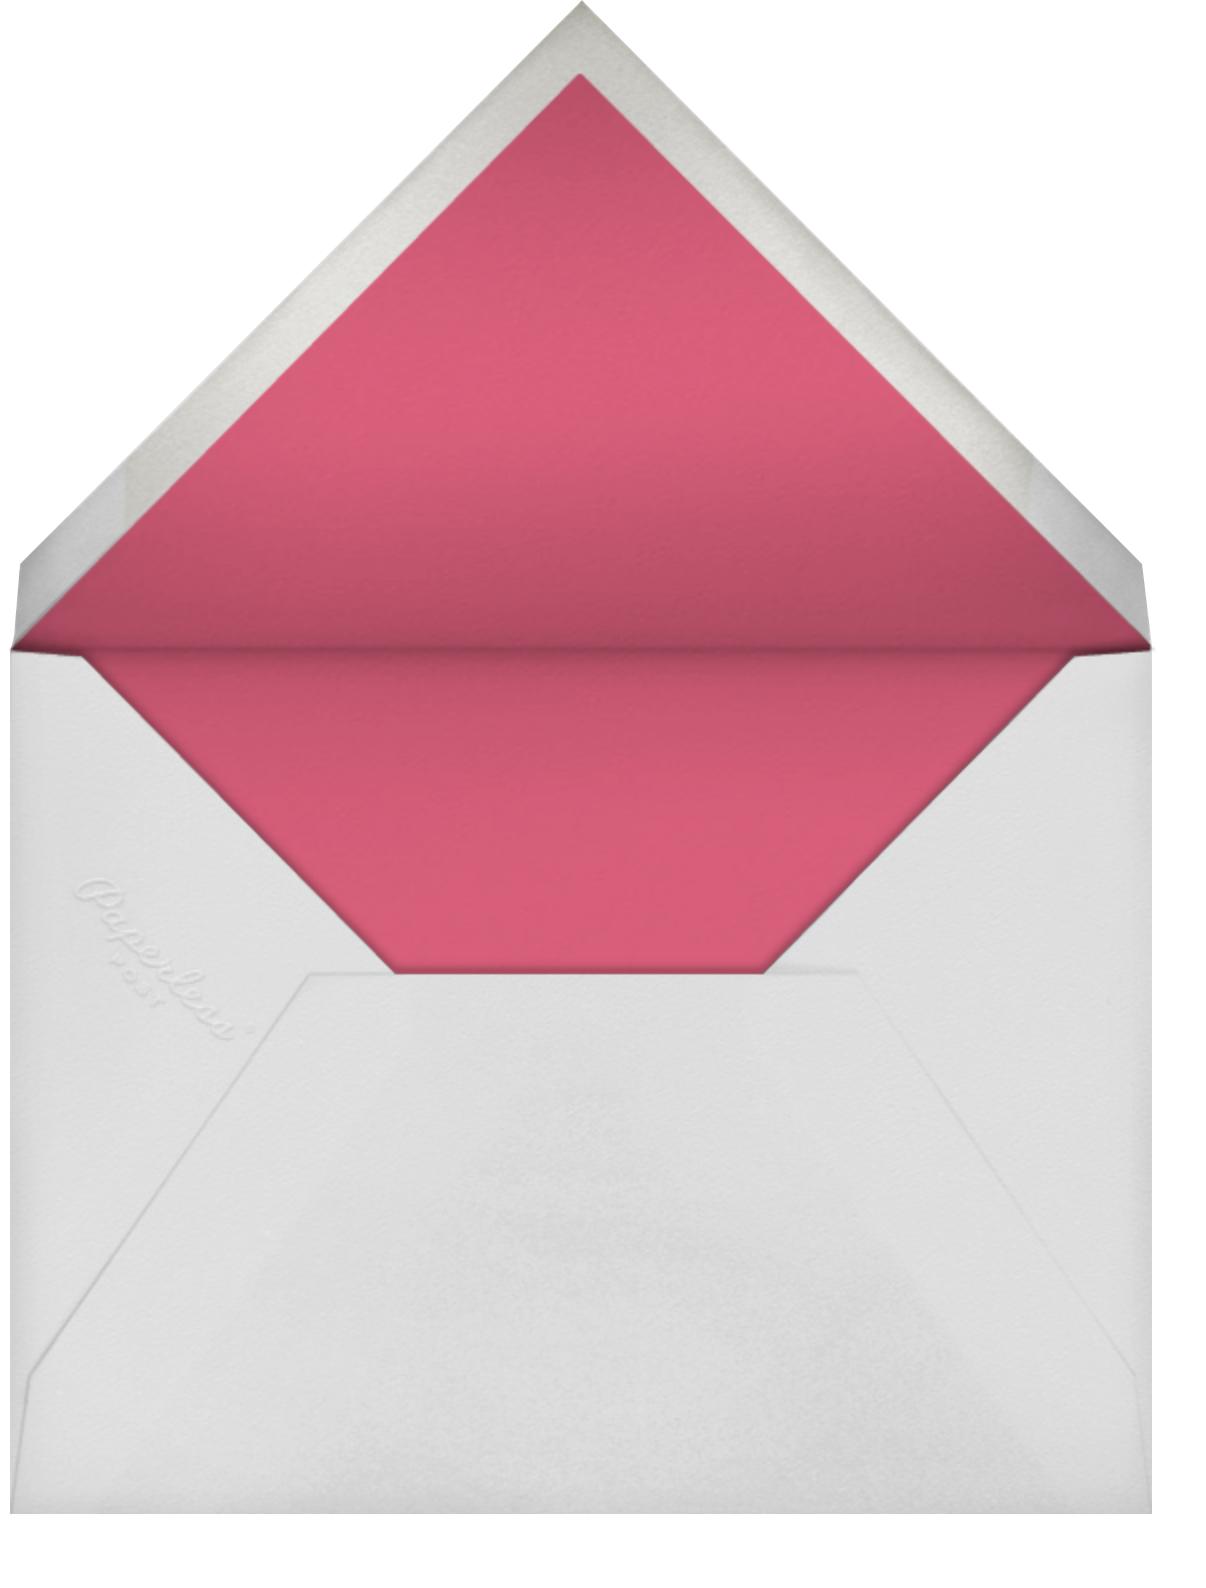 Square Frame (Horizontal) - Red - Paperless Post - Baptism  - envelope back